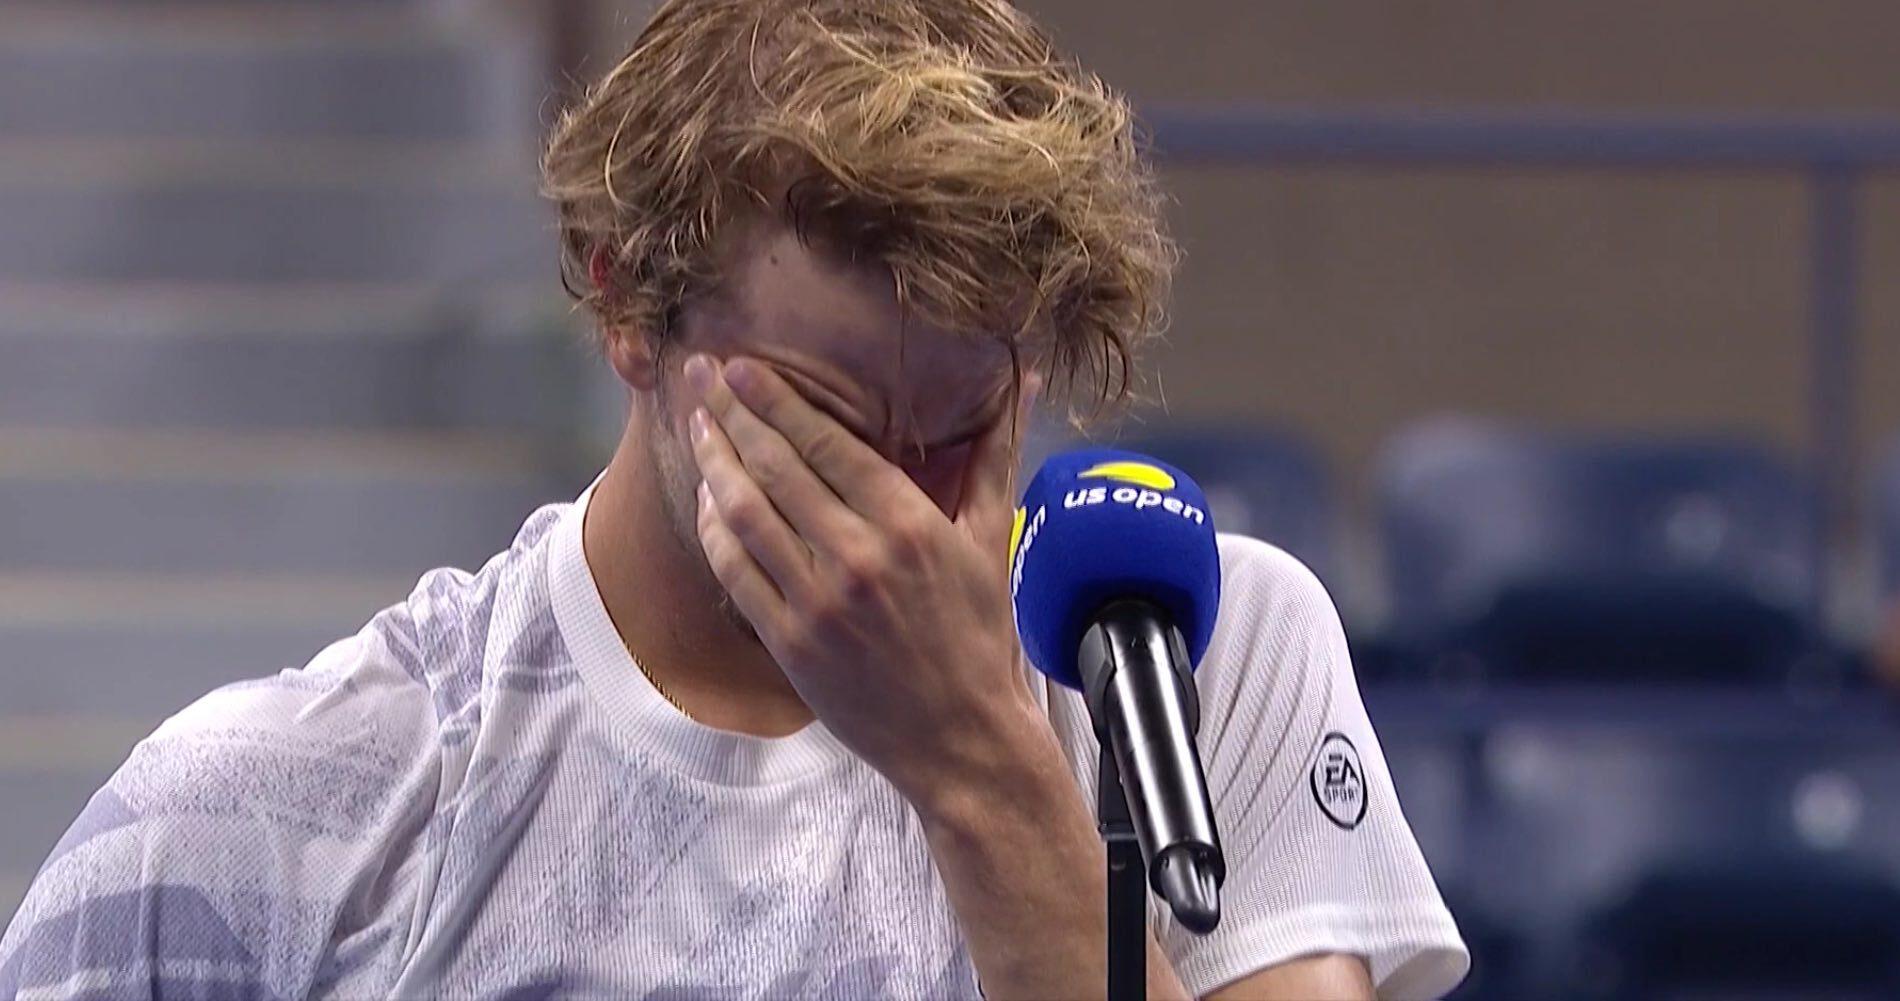 Alexander Zverev US Open tears